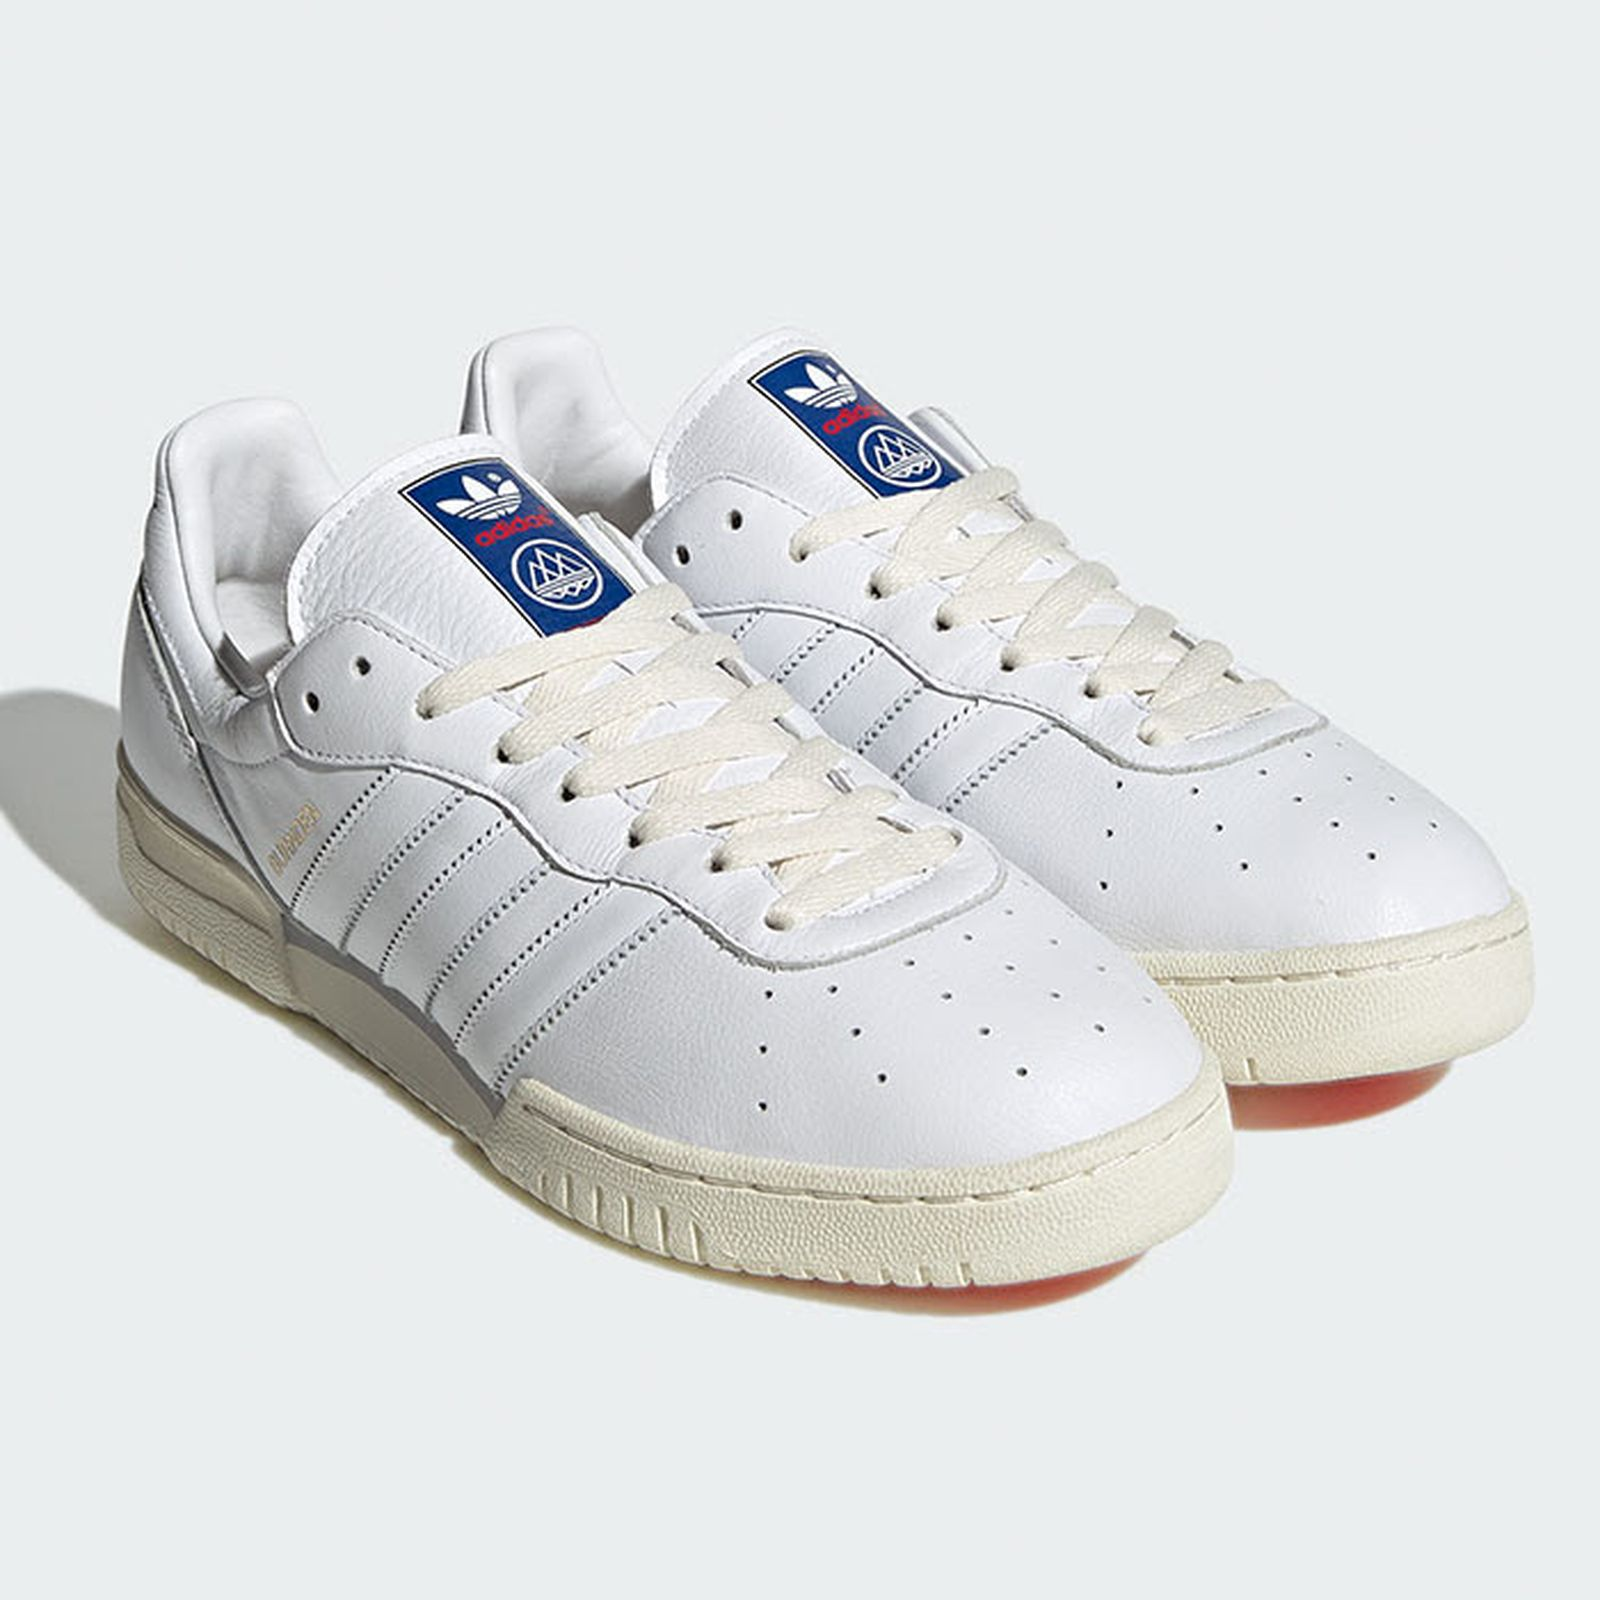 adidas-spezial-ss21-release-info-11